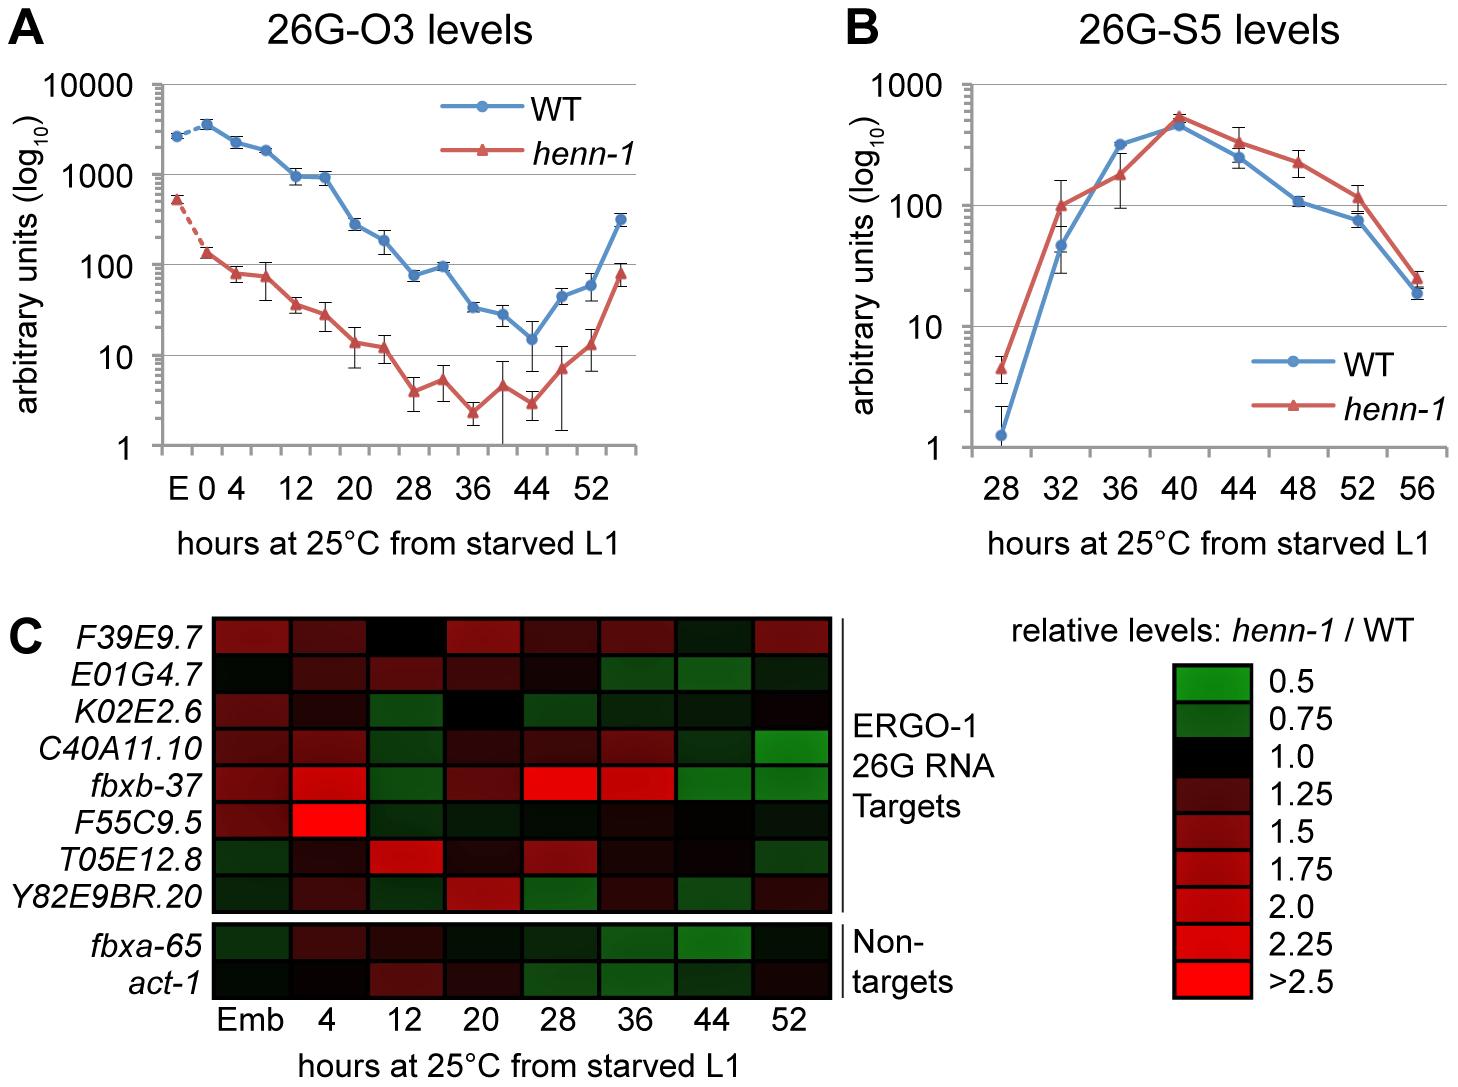 HEN1 Stabilizes ERGO-1 Class, but Not ALG-3/ALG-4 Class, 26G RNAs.